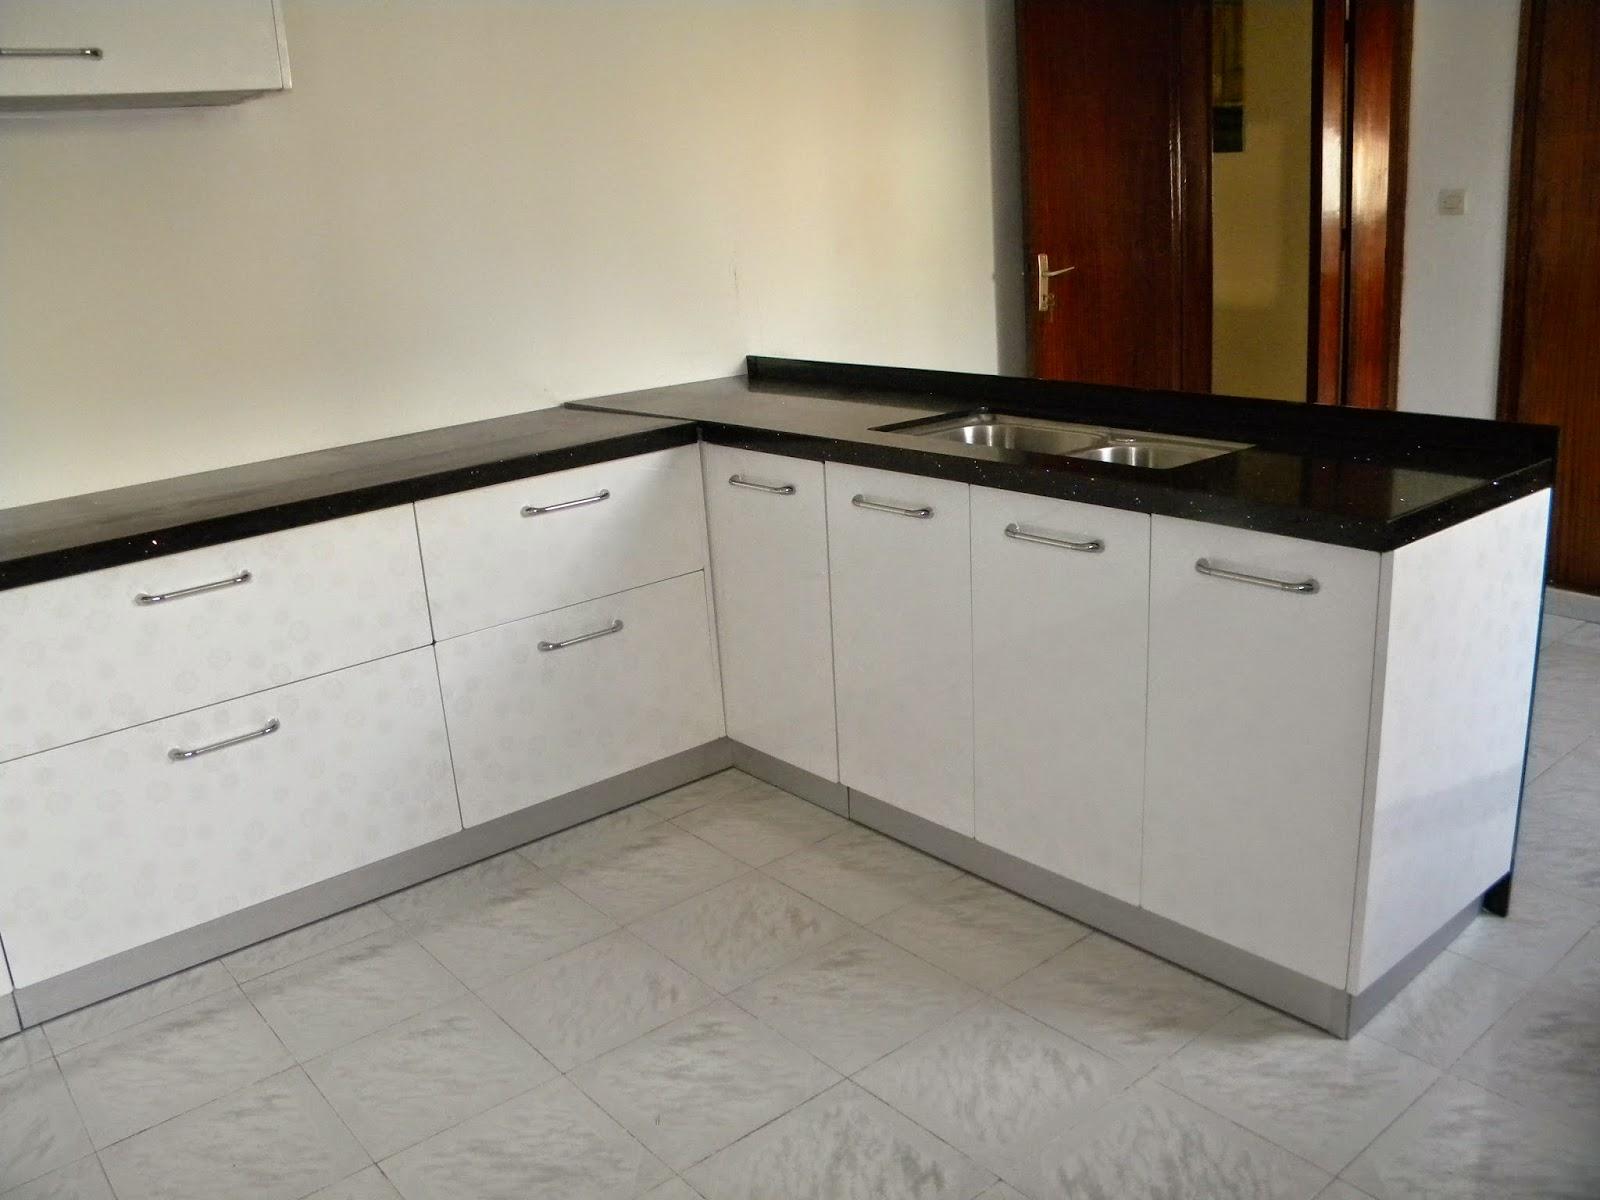 meuble de cuisine à vendre 3.500.000 f cfa - Grand Meuble Cuisine